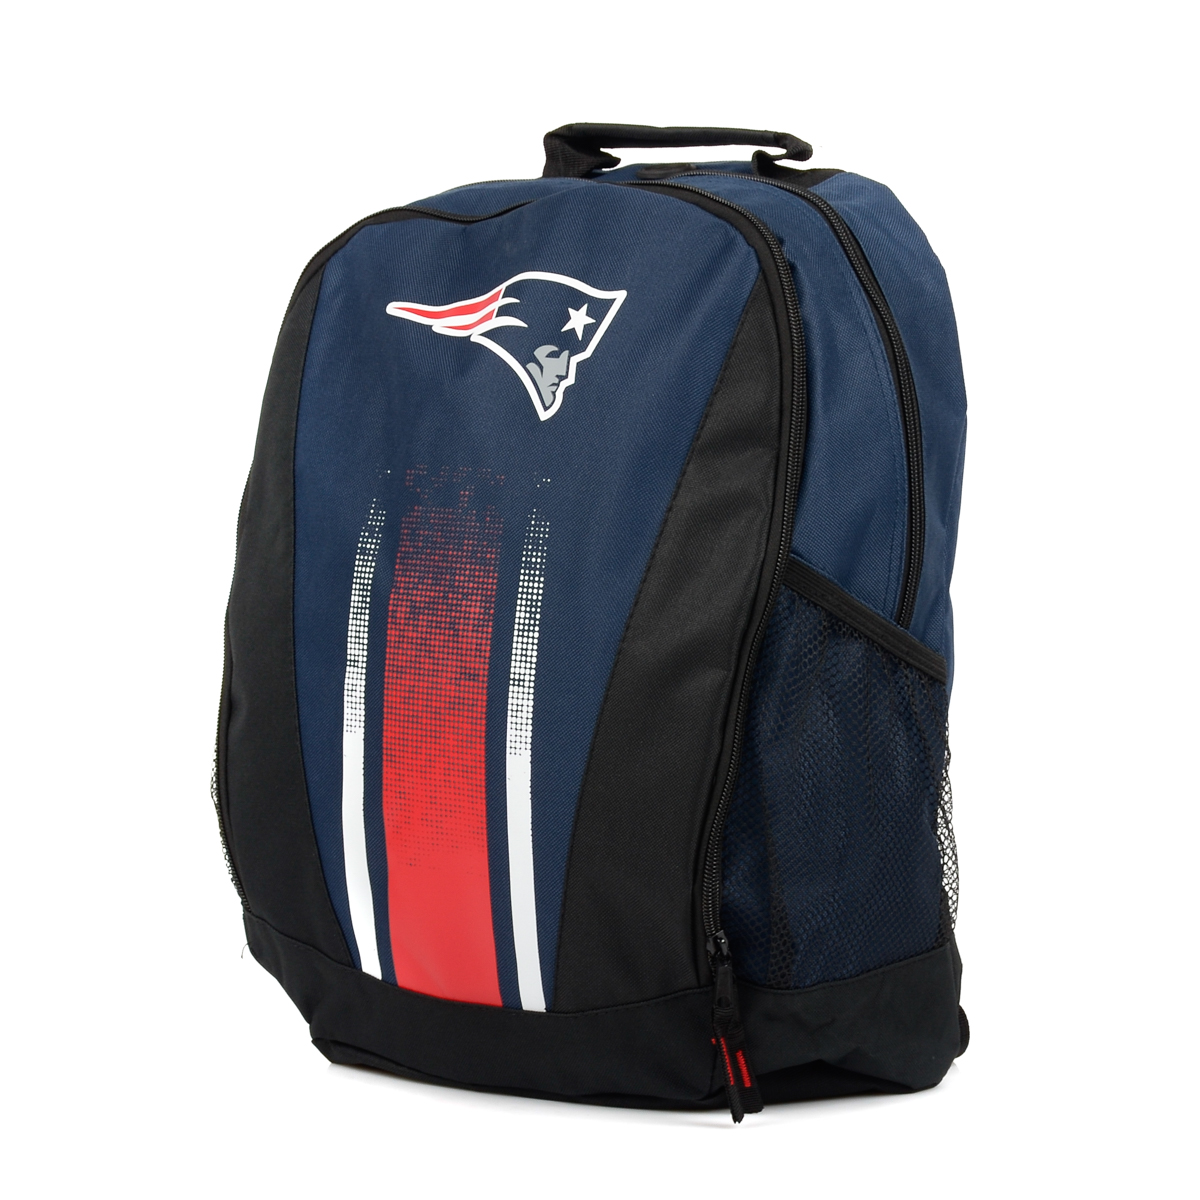 b98b56c0 Forever Collectibles NFL New England Patriots Stripe Primetime ...